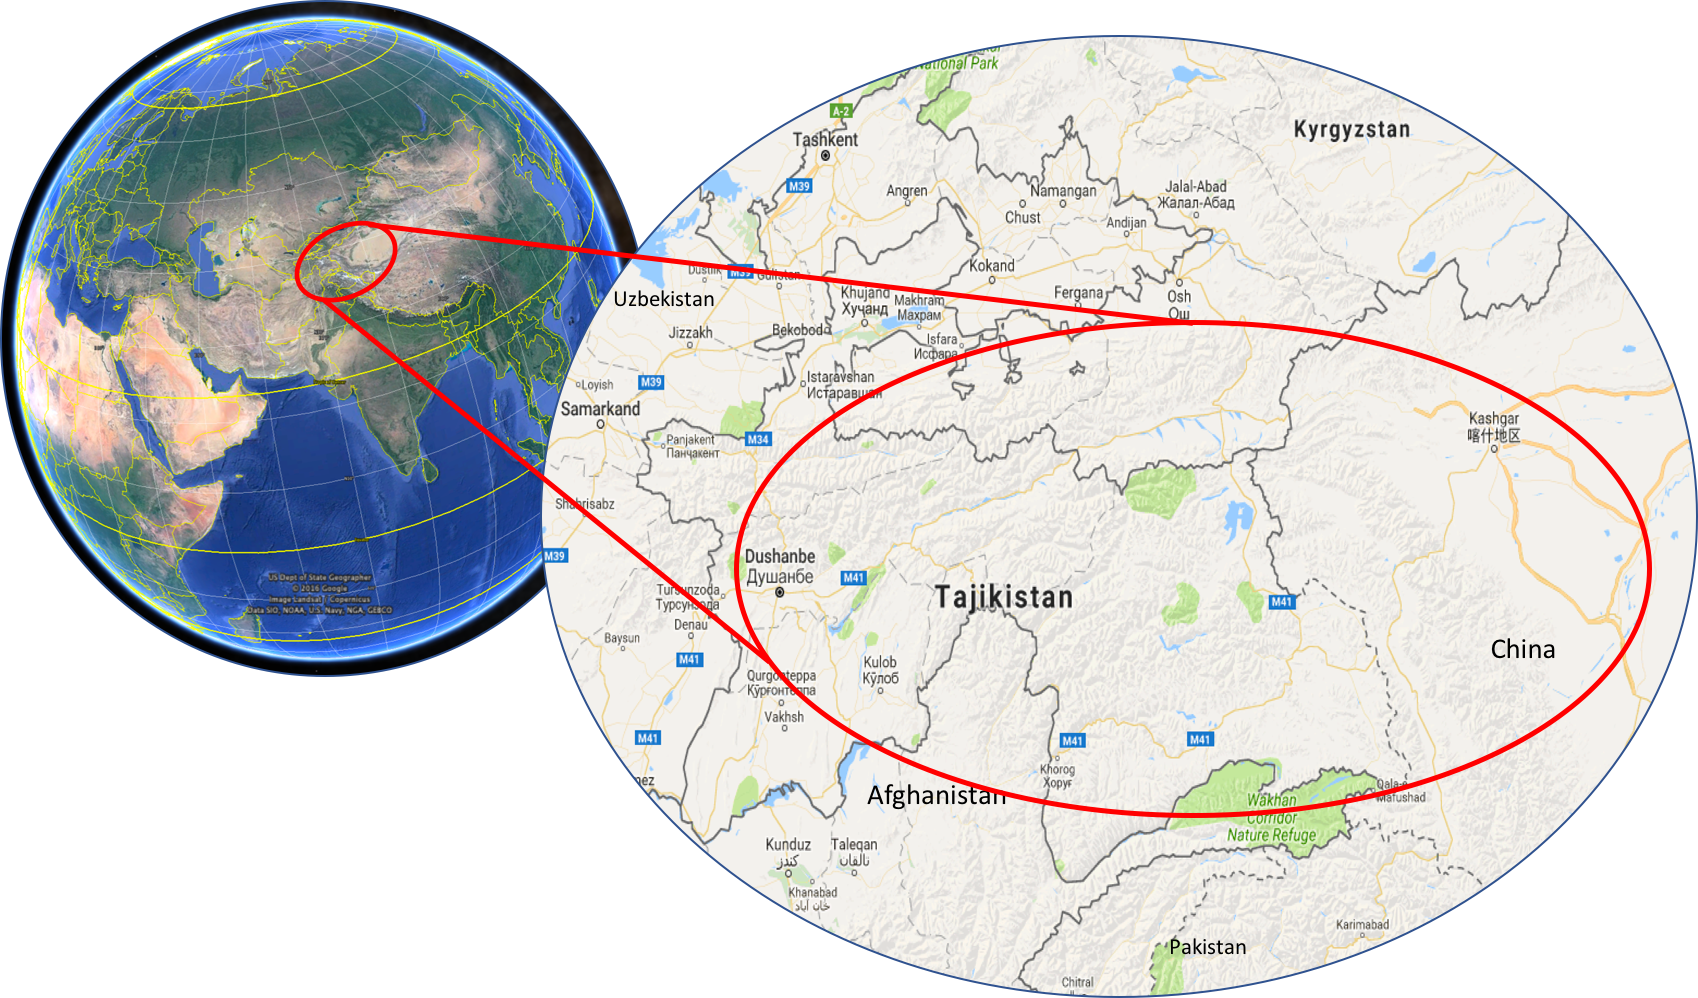 Tajikistan & the Pamir Highway